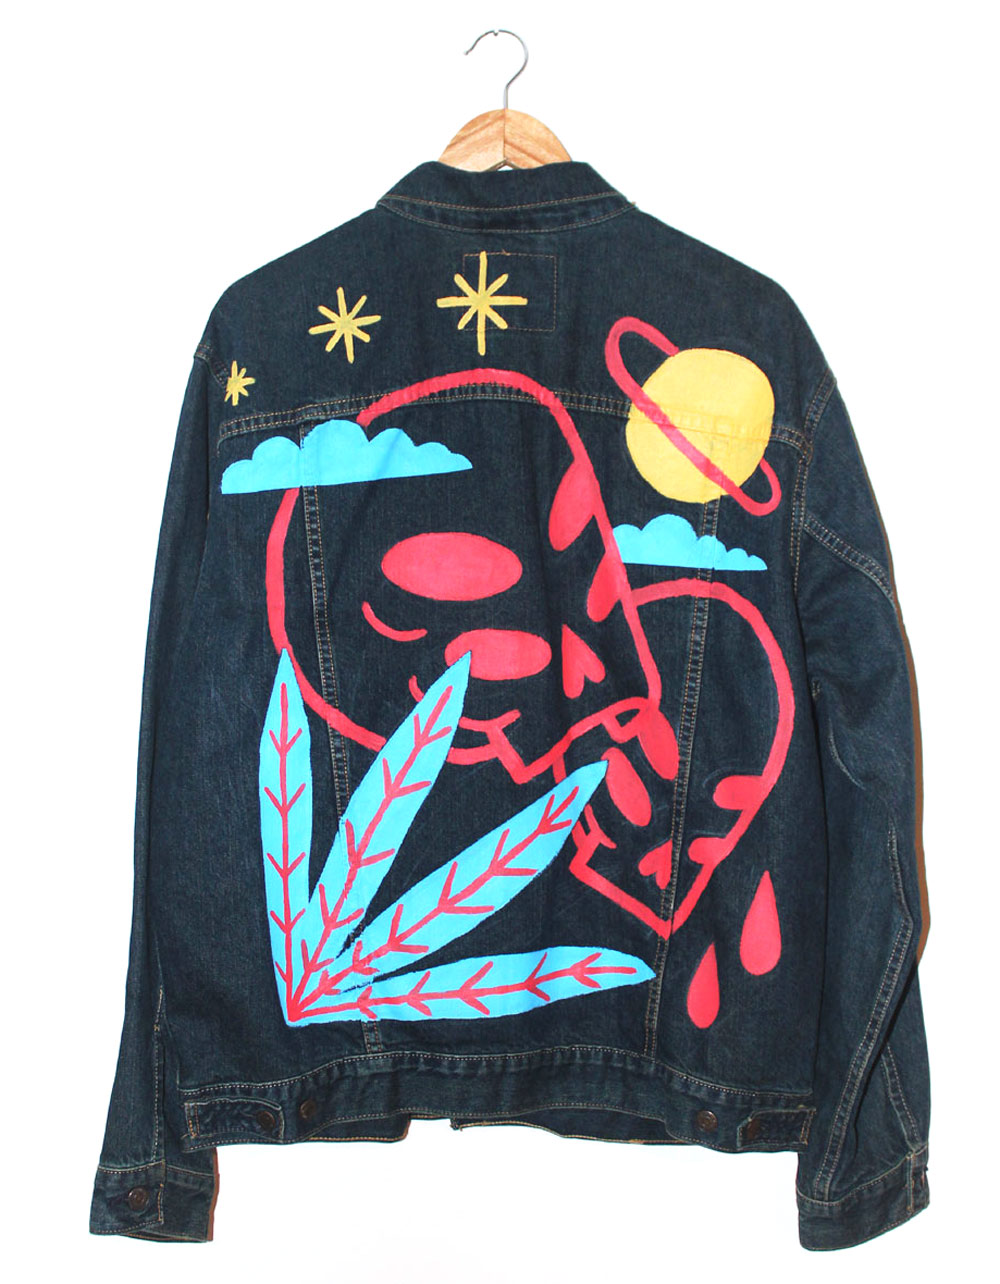 eds-jacket-insta-post.jpg